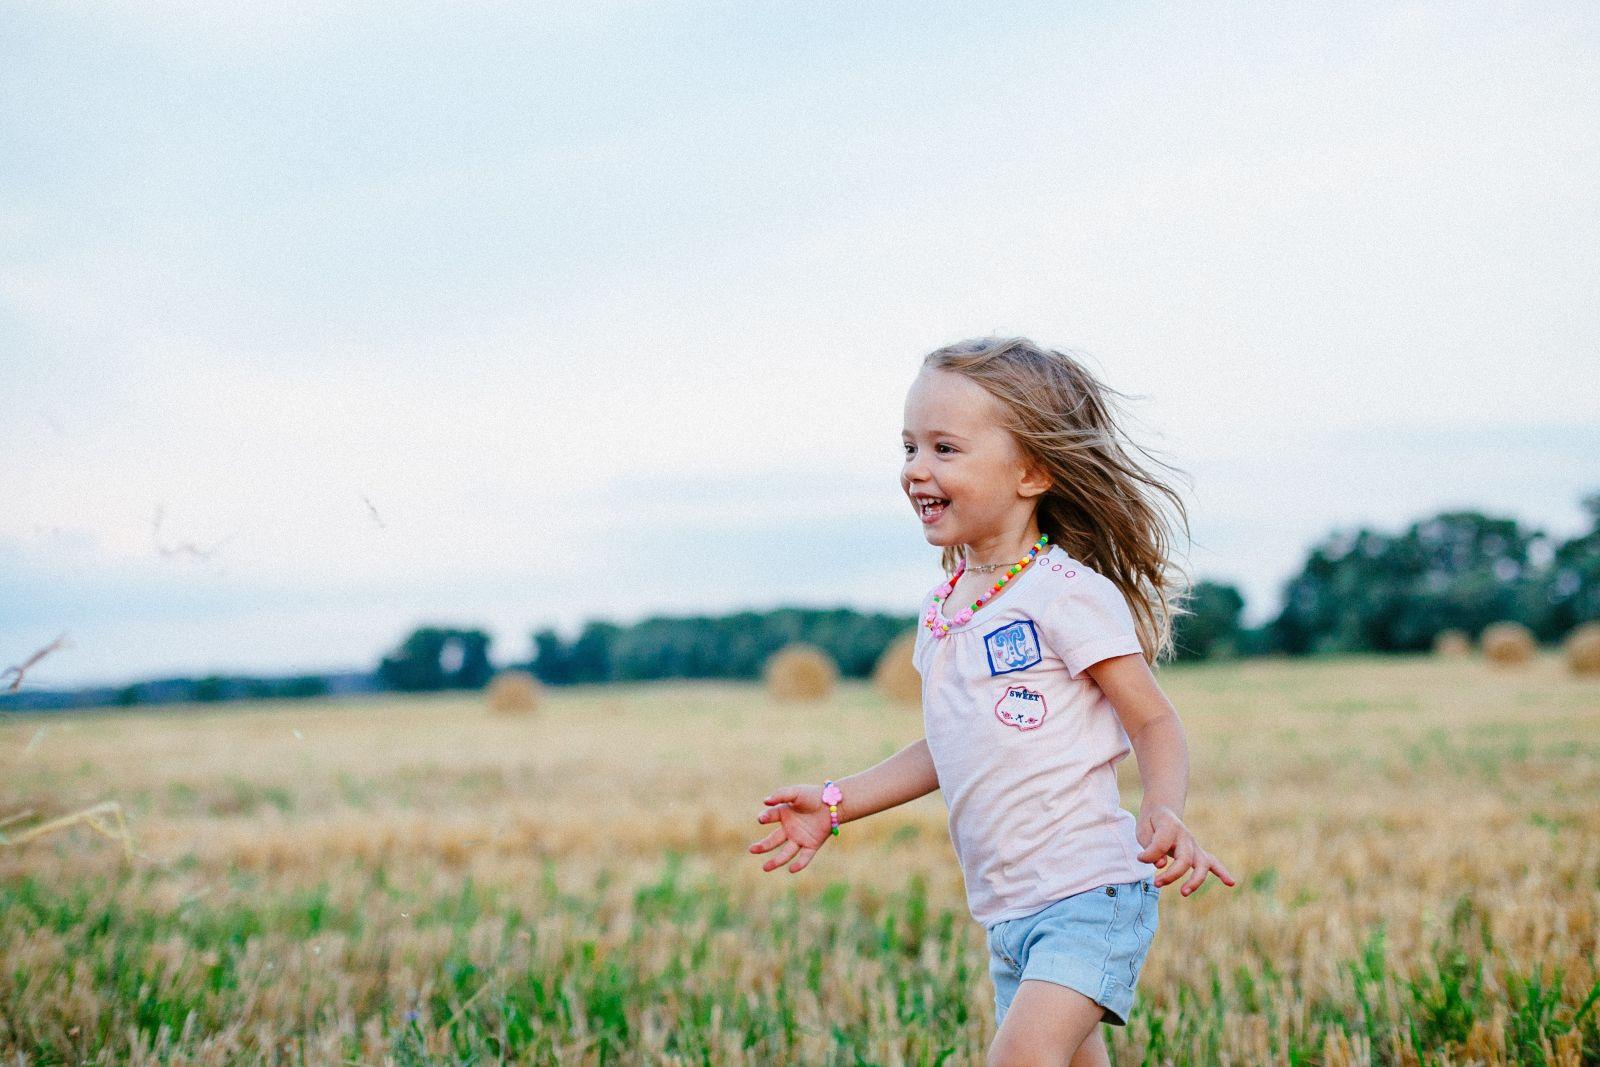 Smiling girl running through field